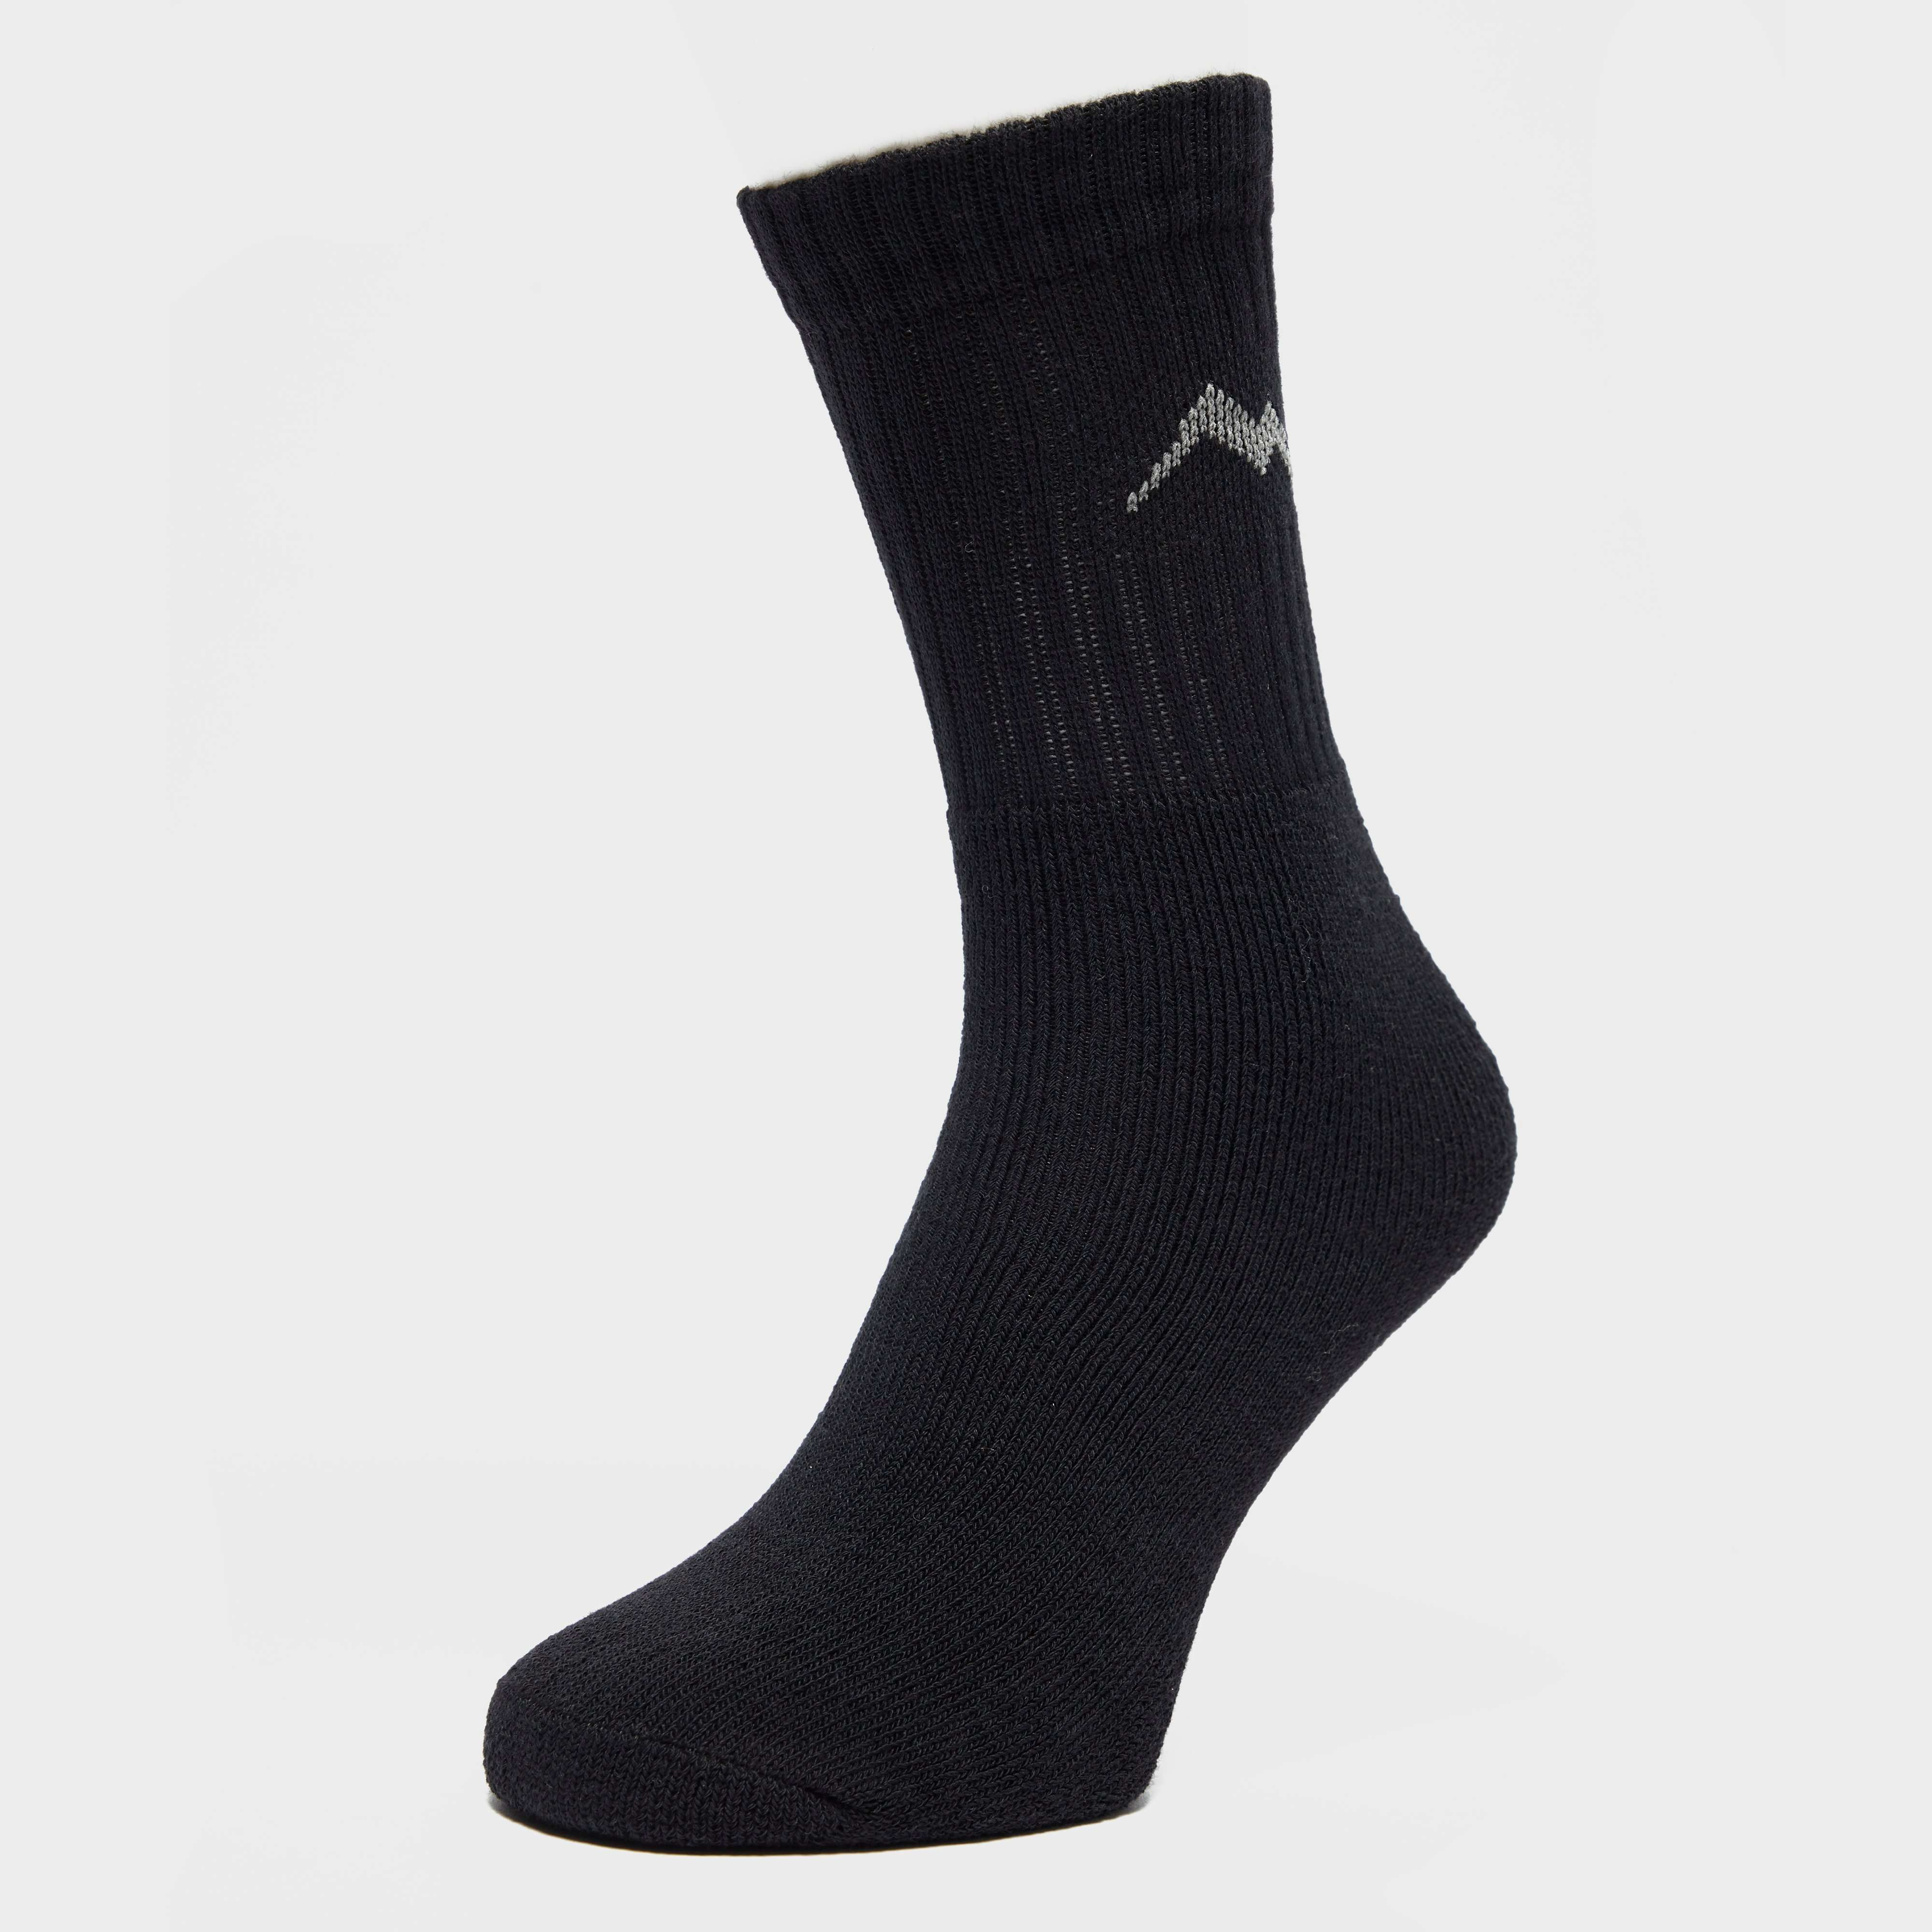 PETER STORM Men's Multi Activity Sports Sock - 3 Pack